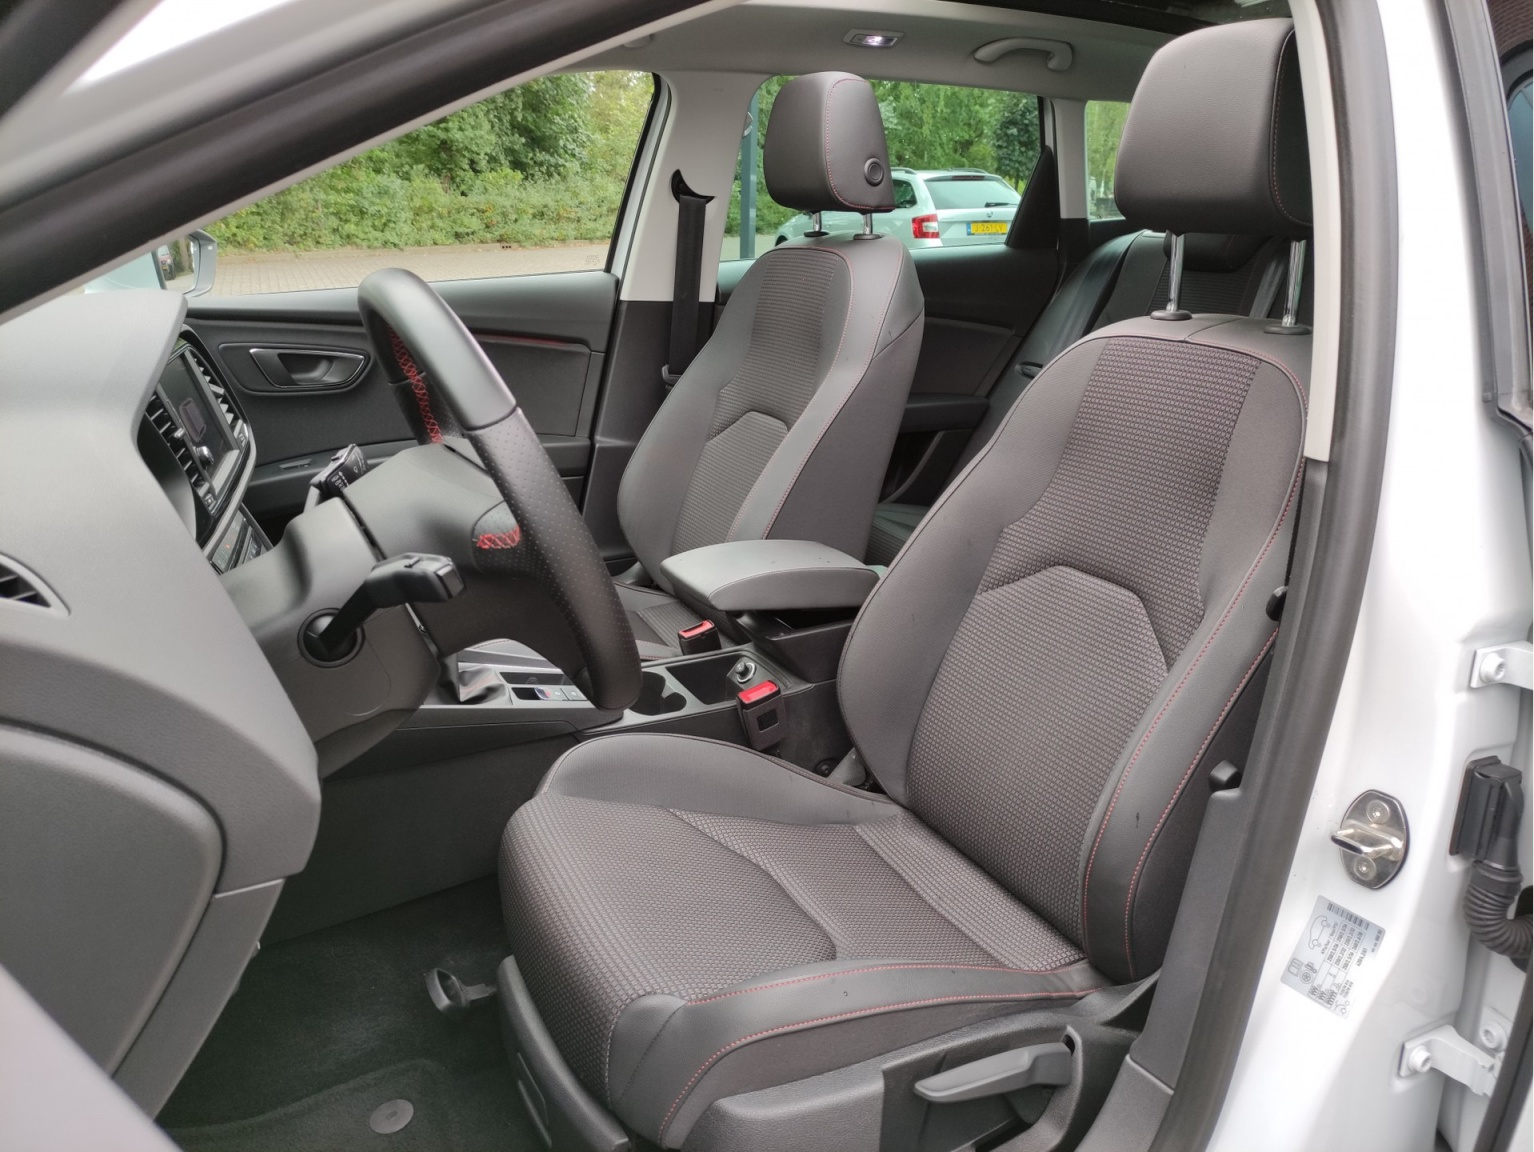 SEAT-Leon-25